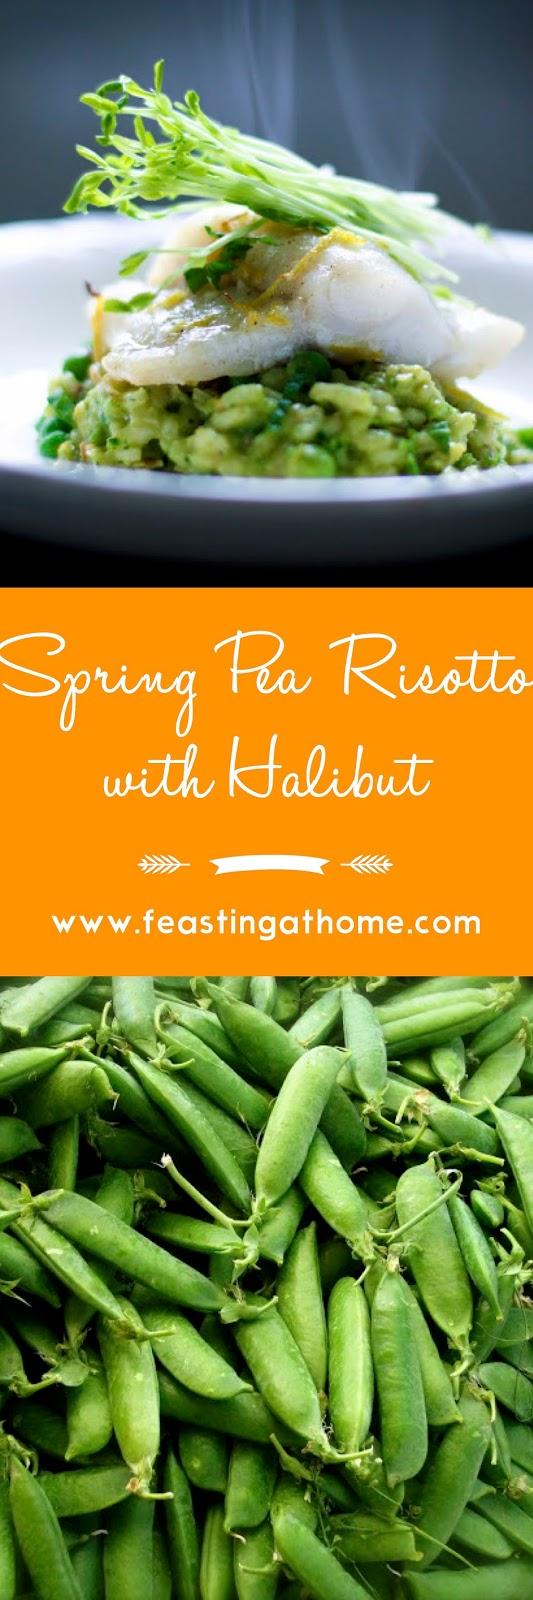 Spring Pea Risotto with Halibut | www.feastingathome.com